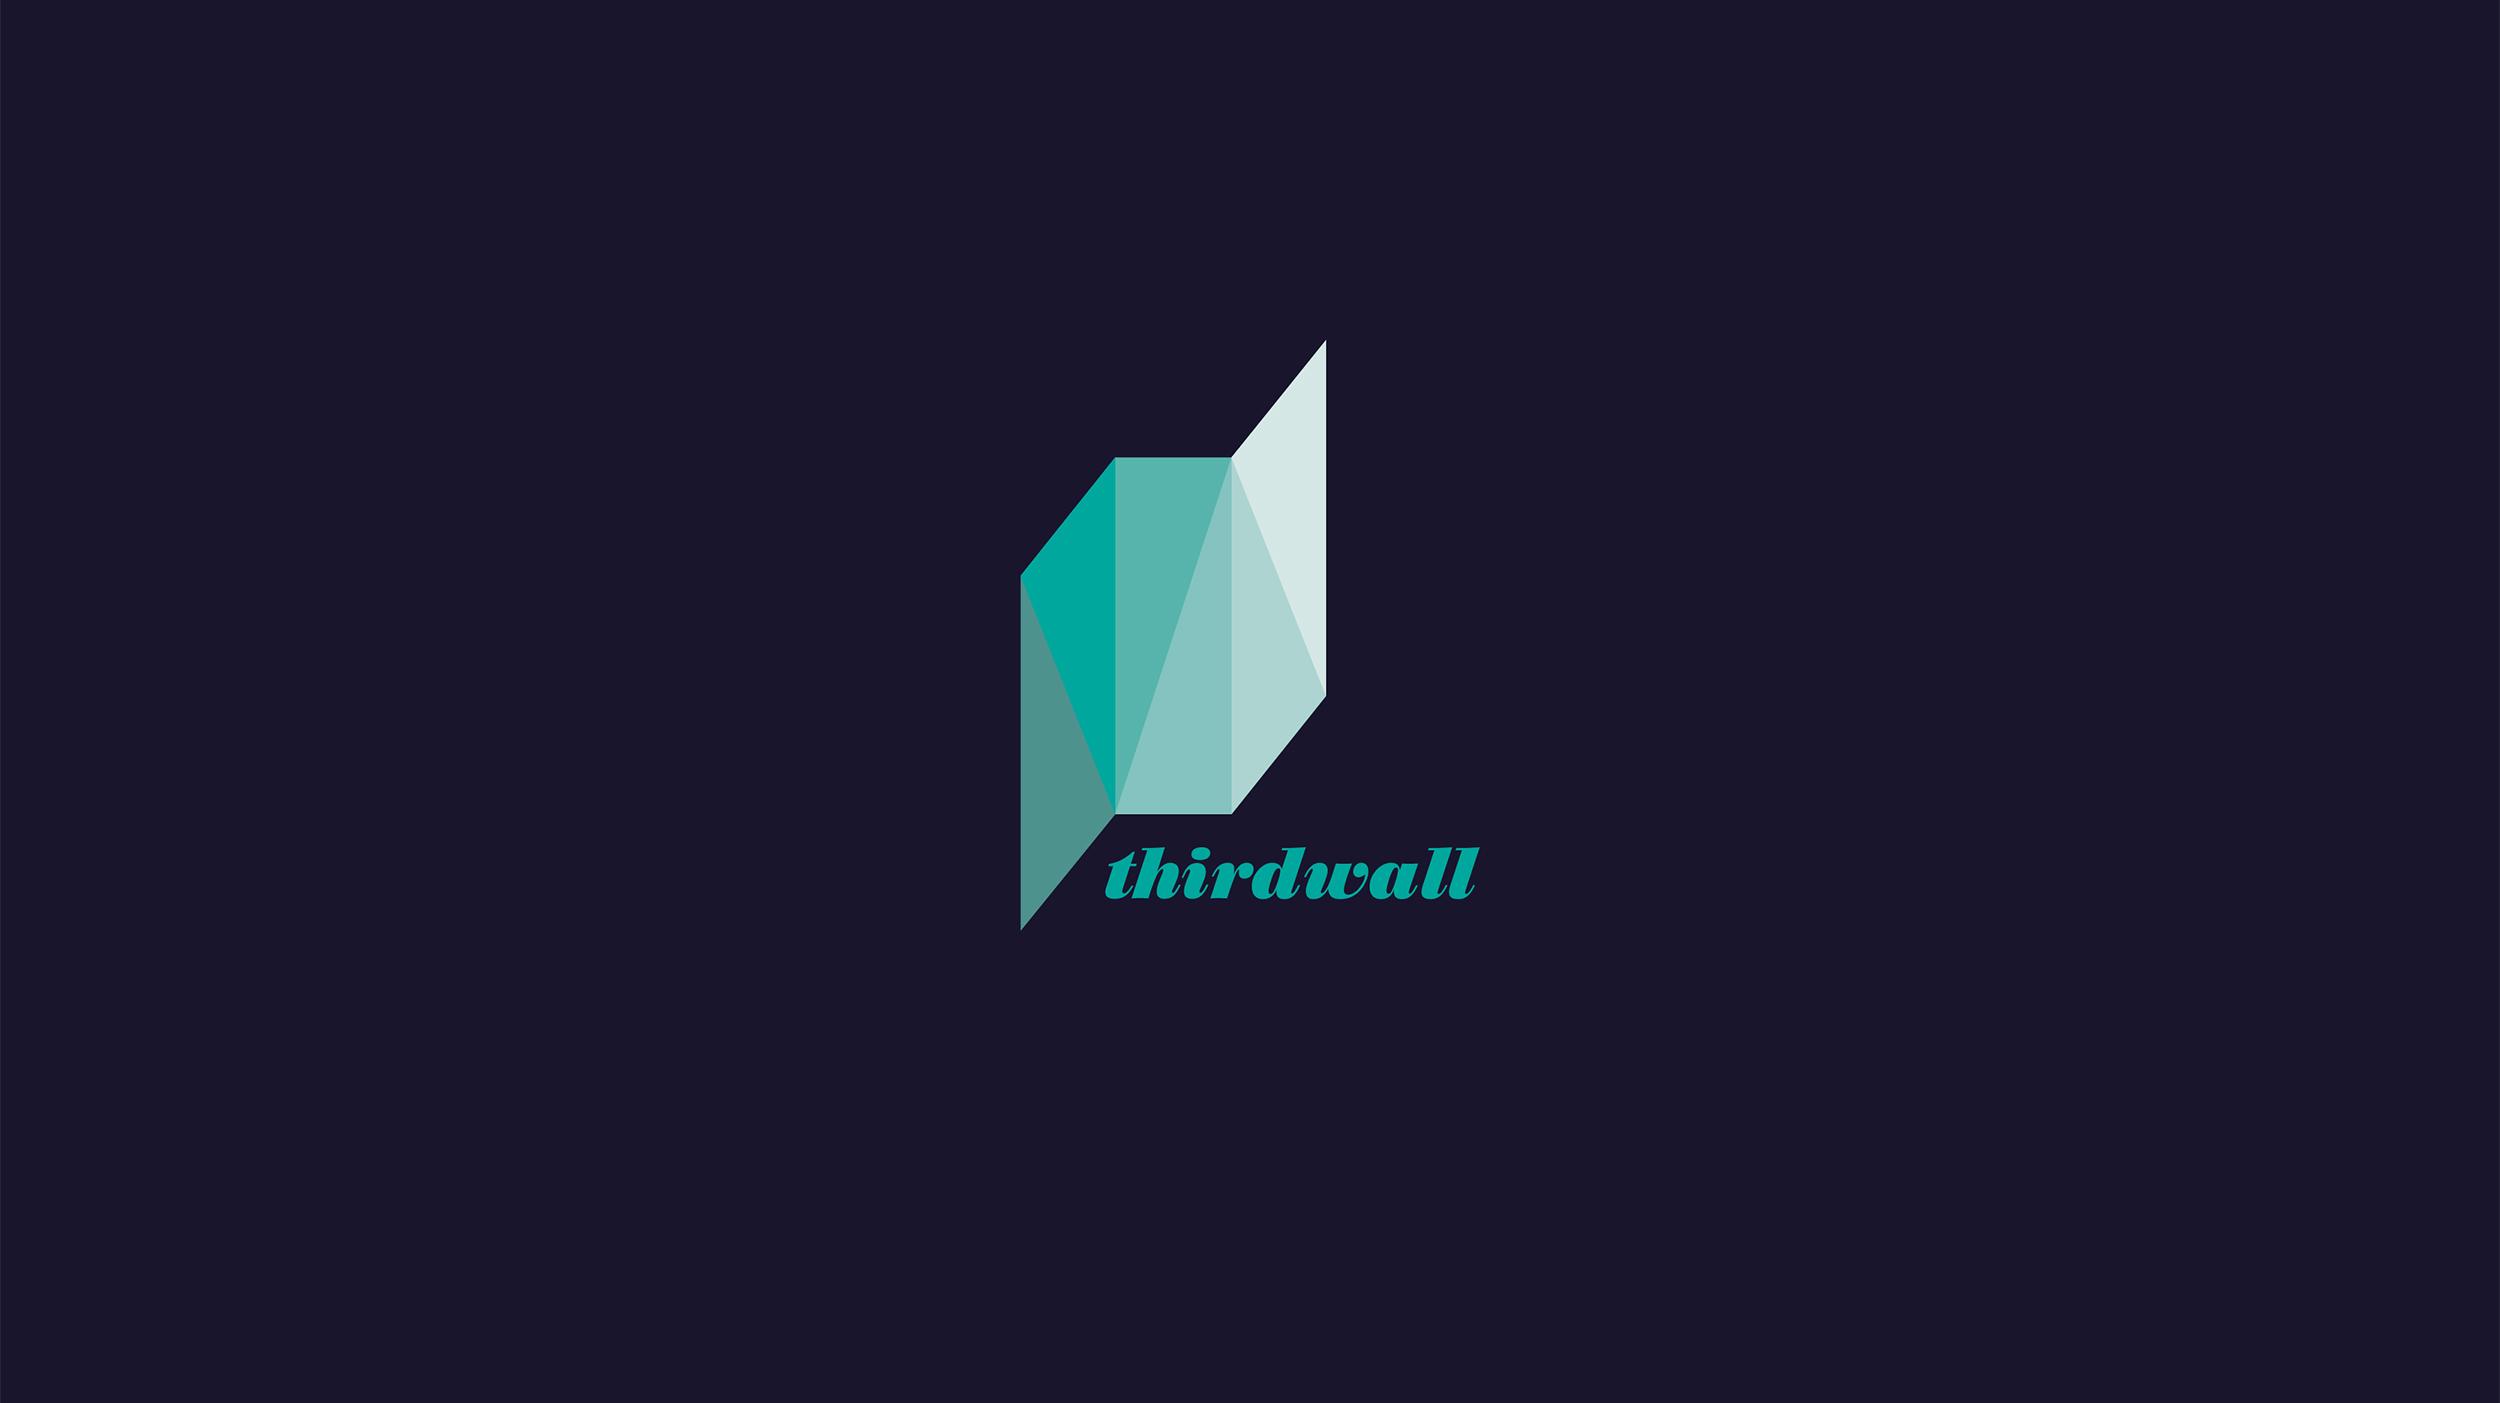 thirdwall_logo.jpg